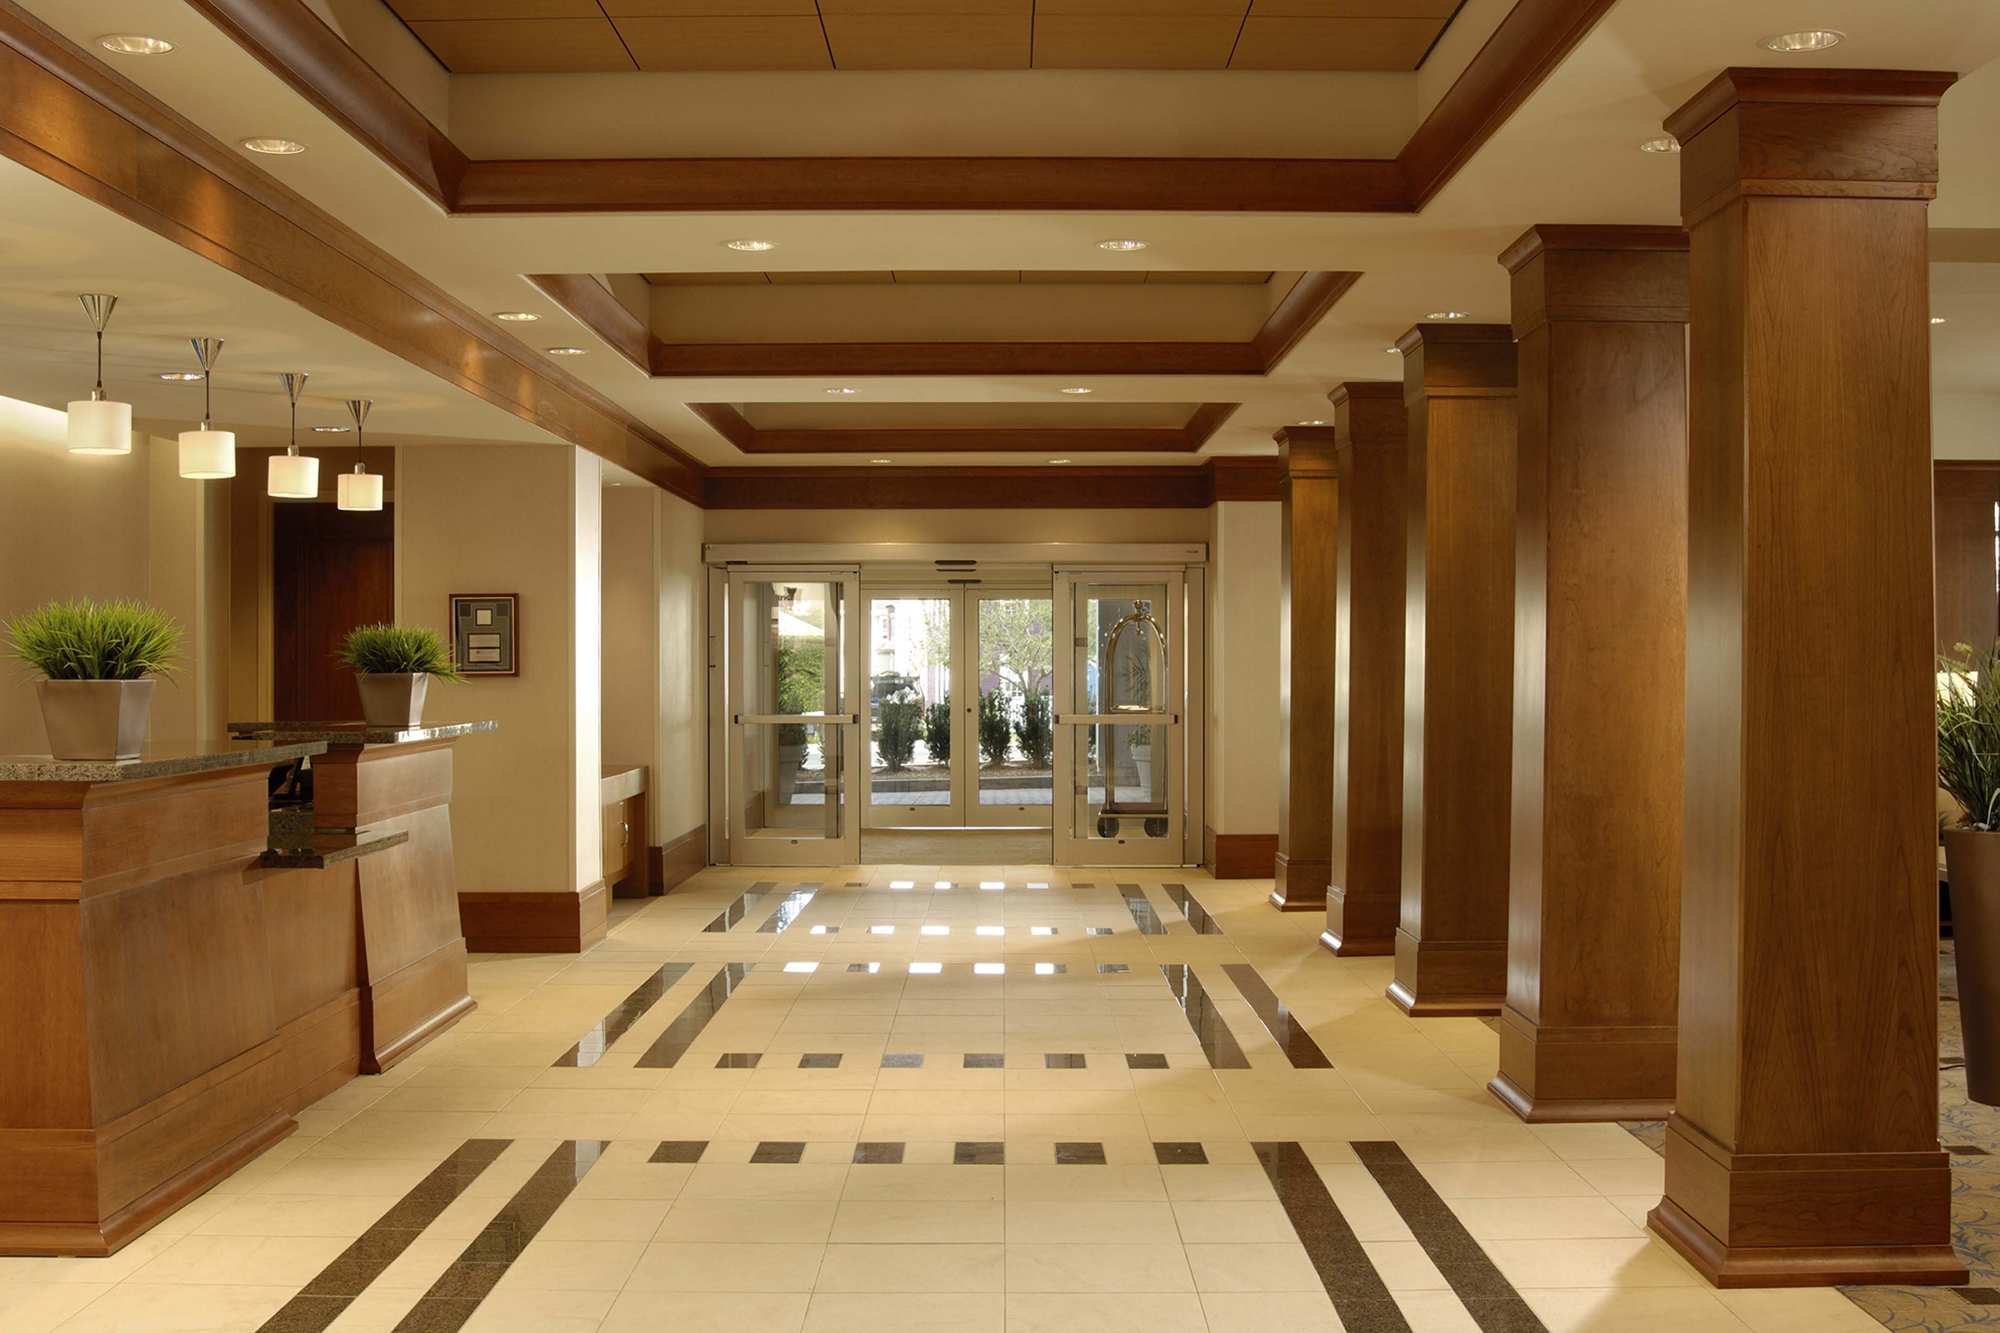 Hilton Garden Inn Hotel Design